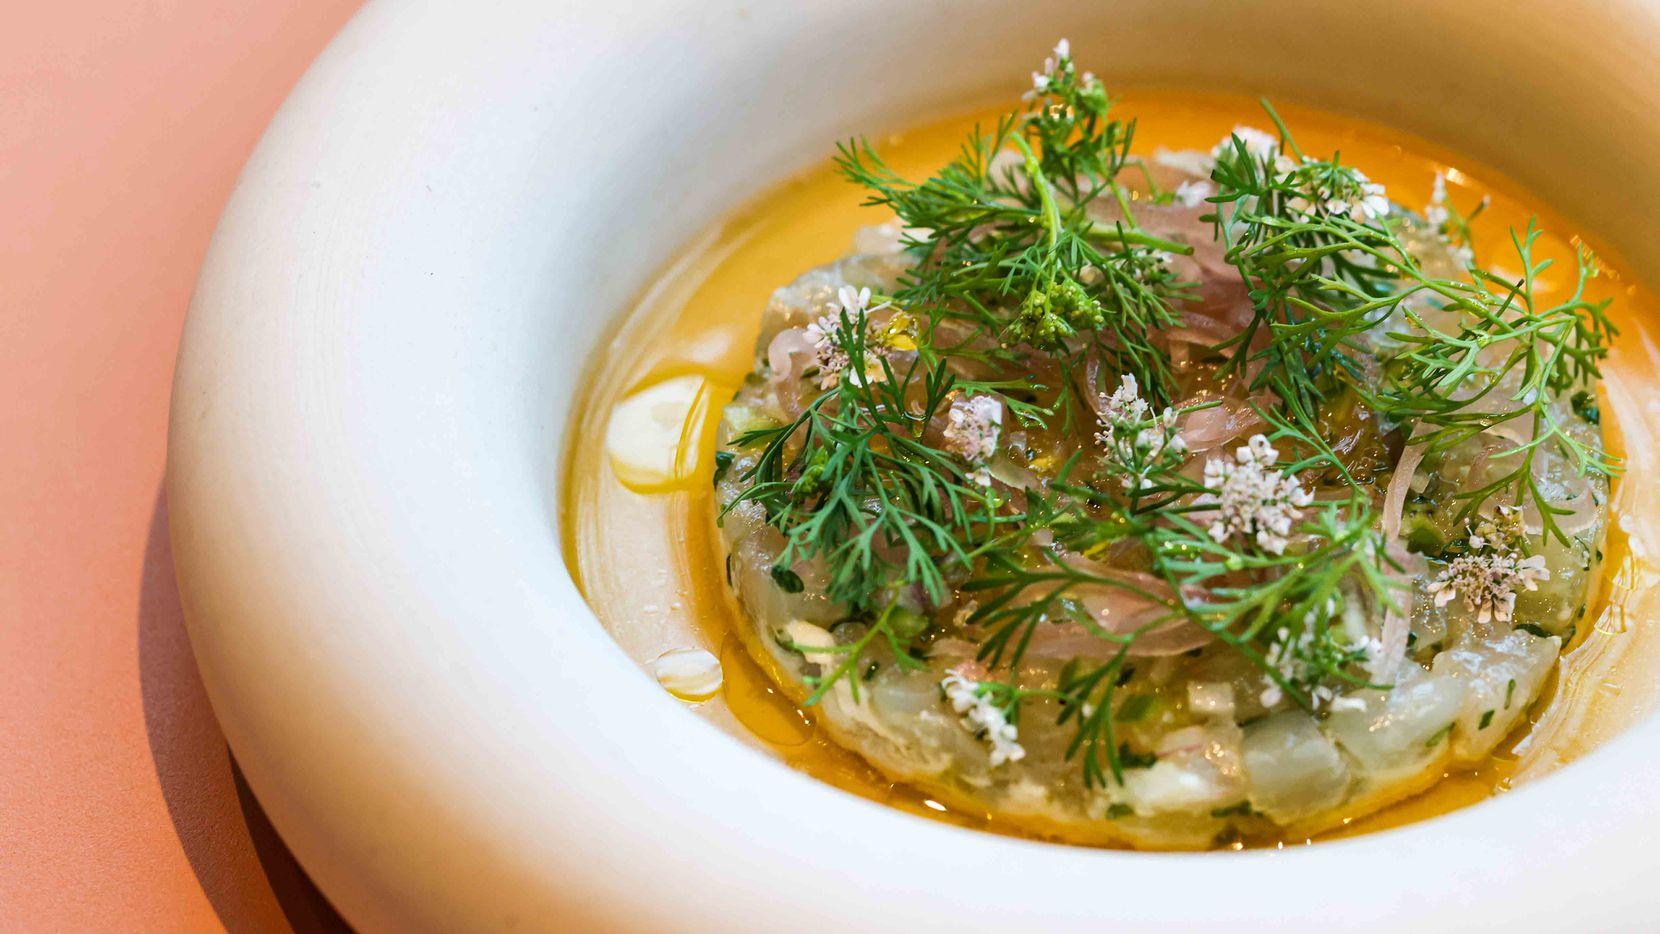 Cured fluke tartare is a delicate dish on executive chef Nilton 'Junior' Borges' menu at new Dallas restaurant Meridian.